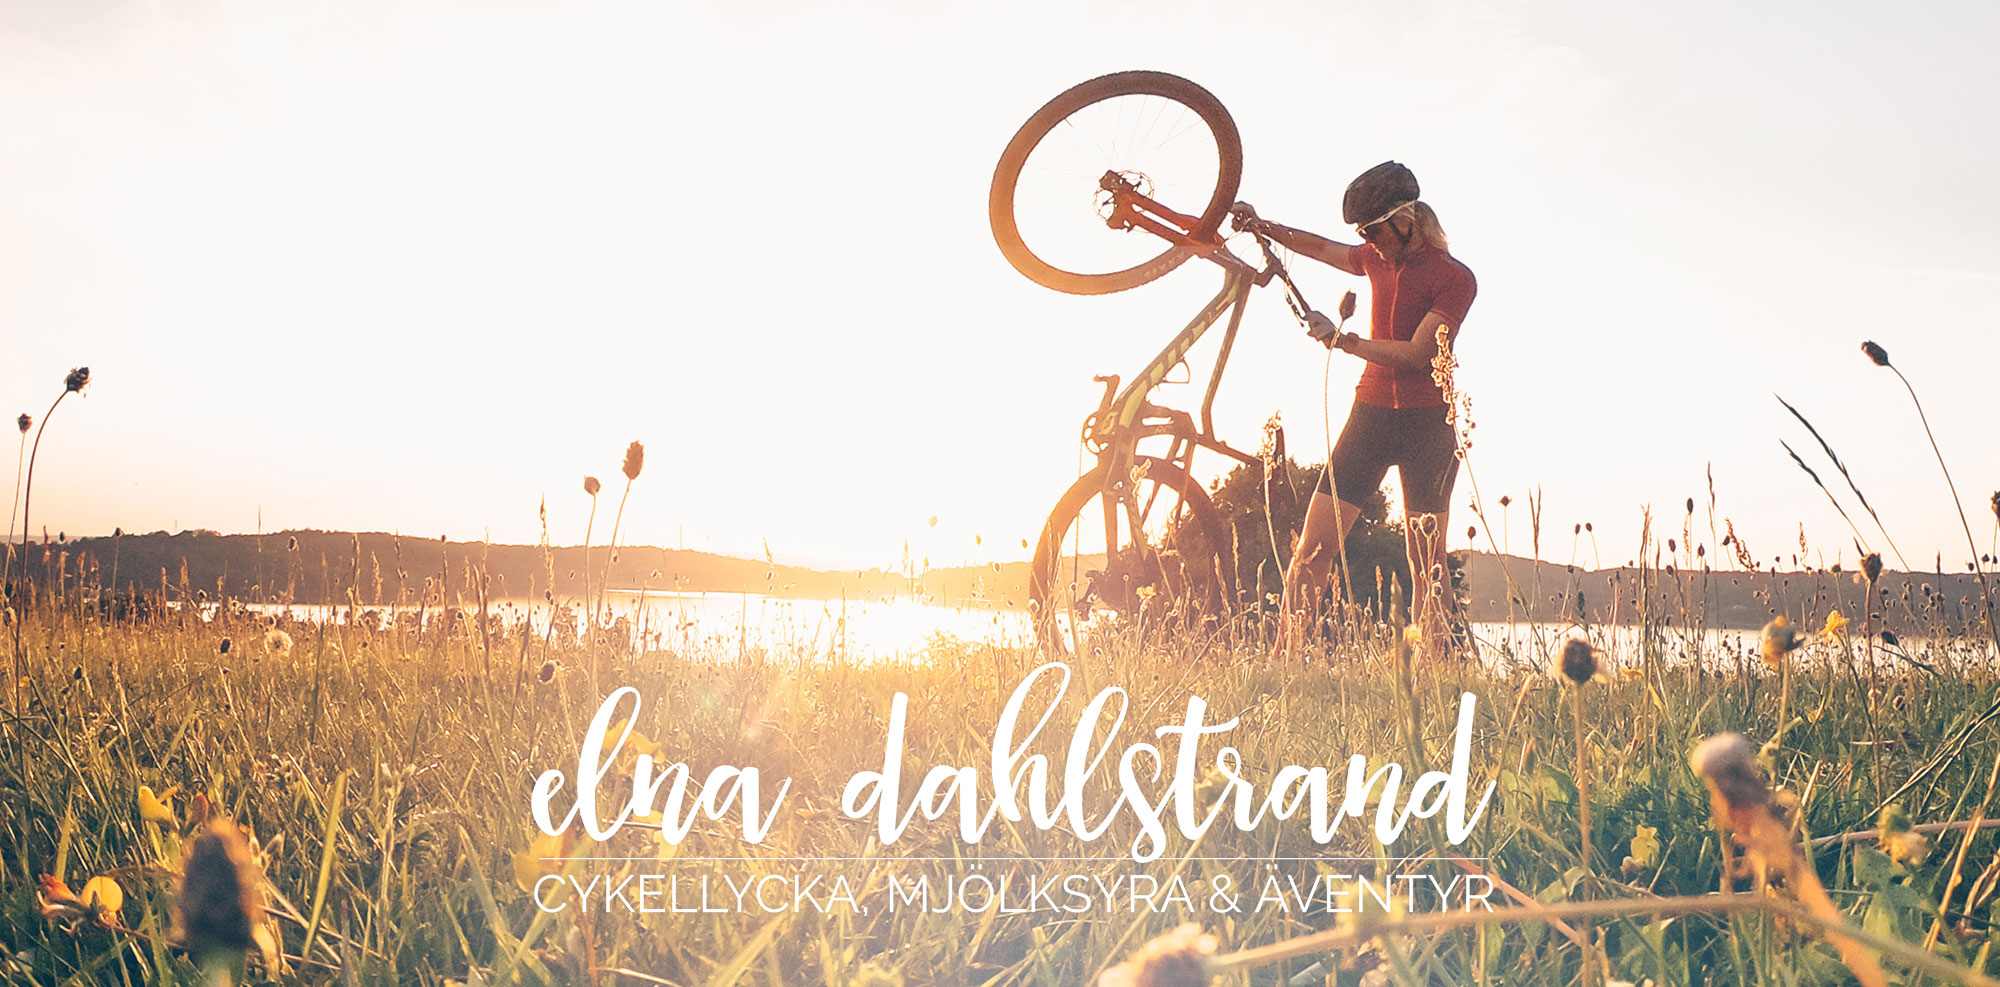 Elna Dahlstrand